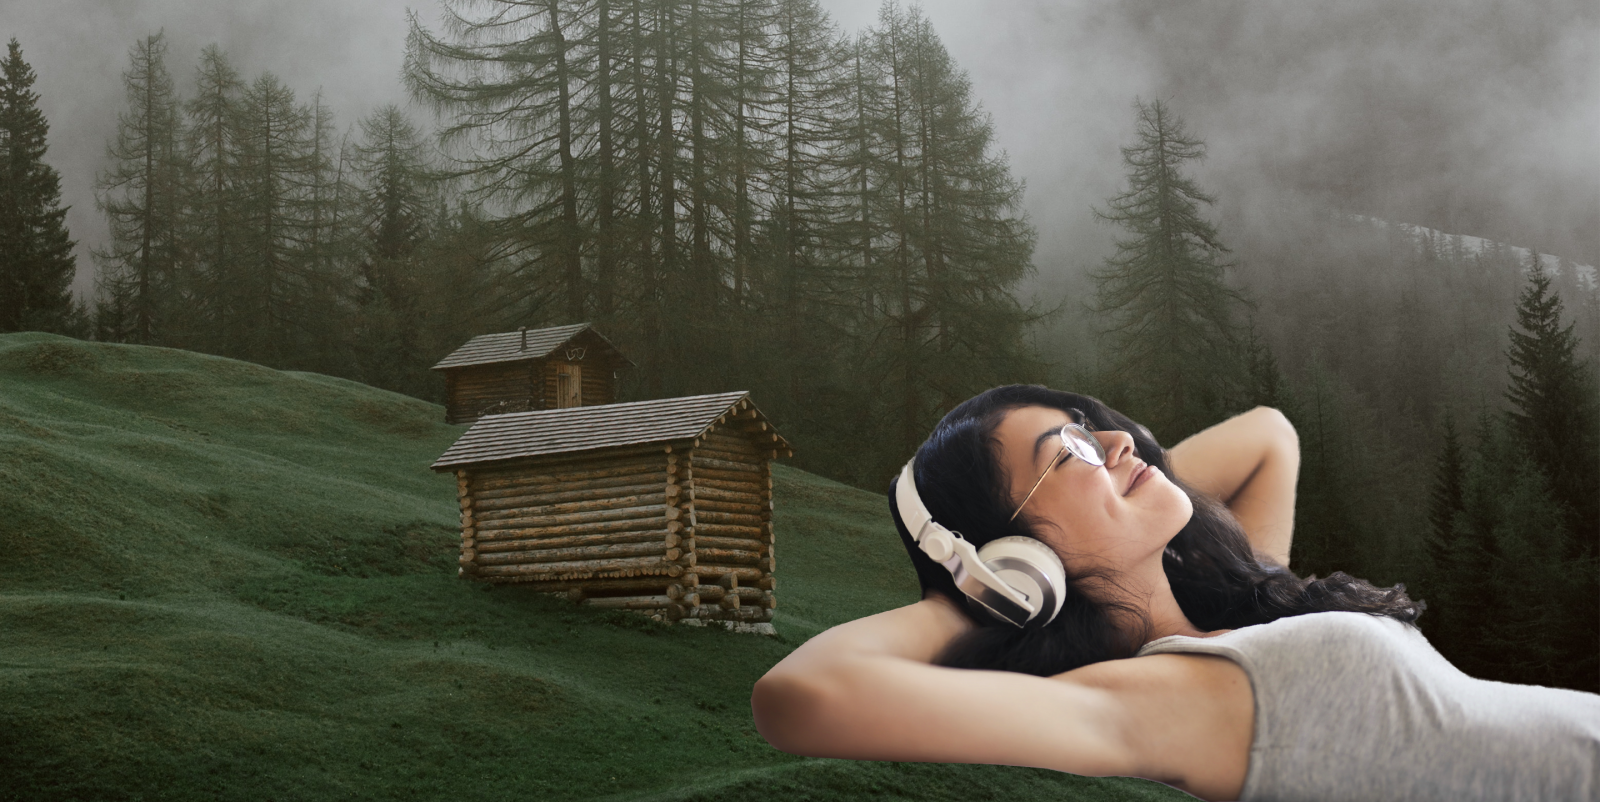 sustainability podcasts 8shades